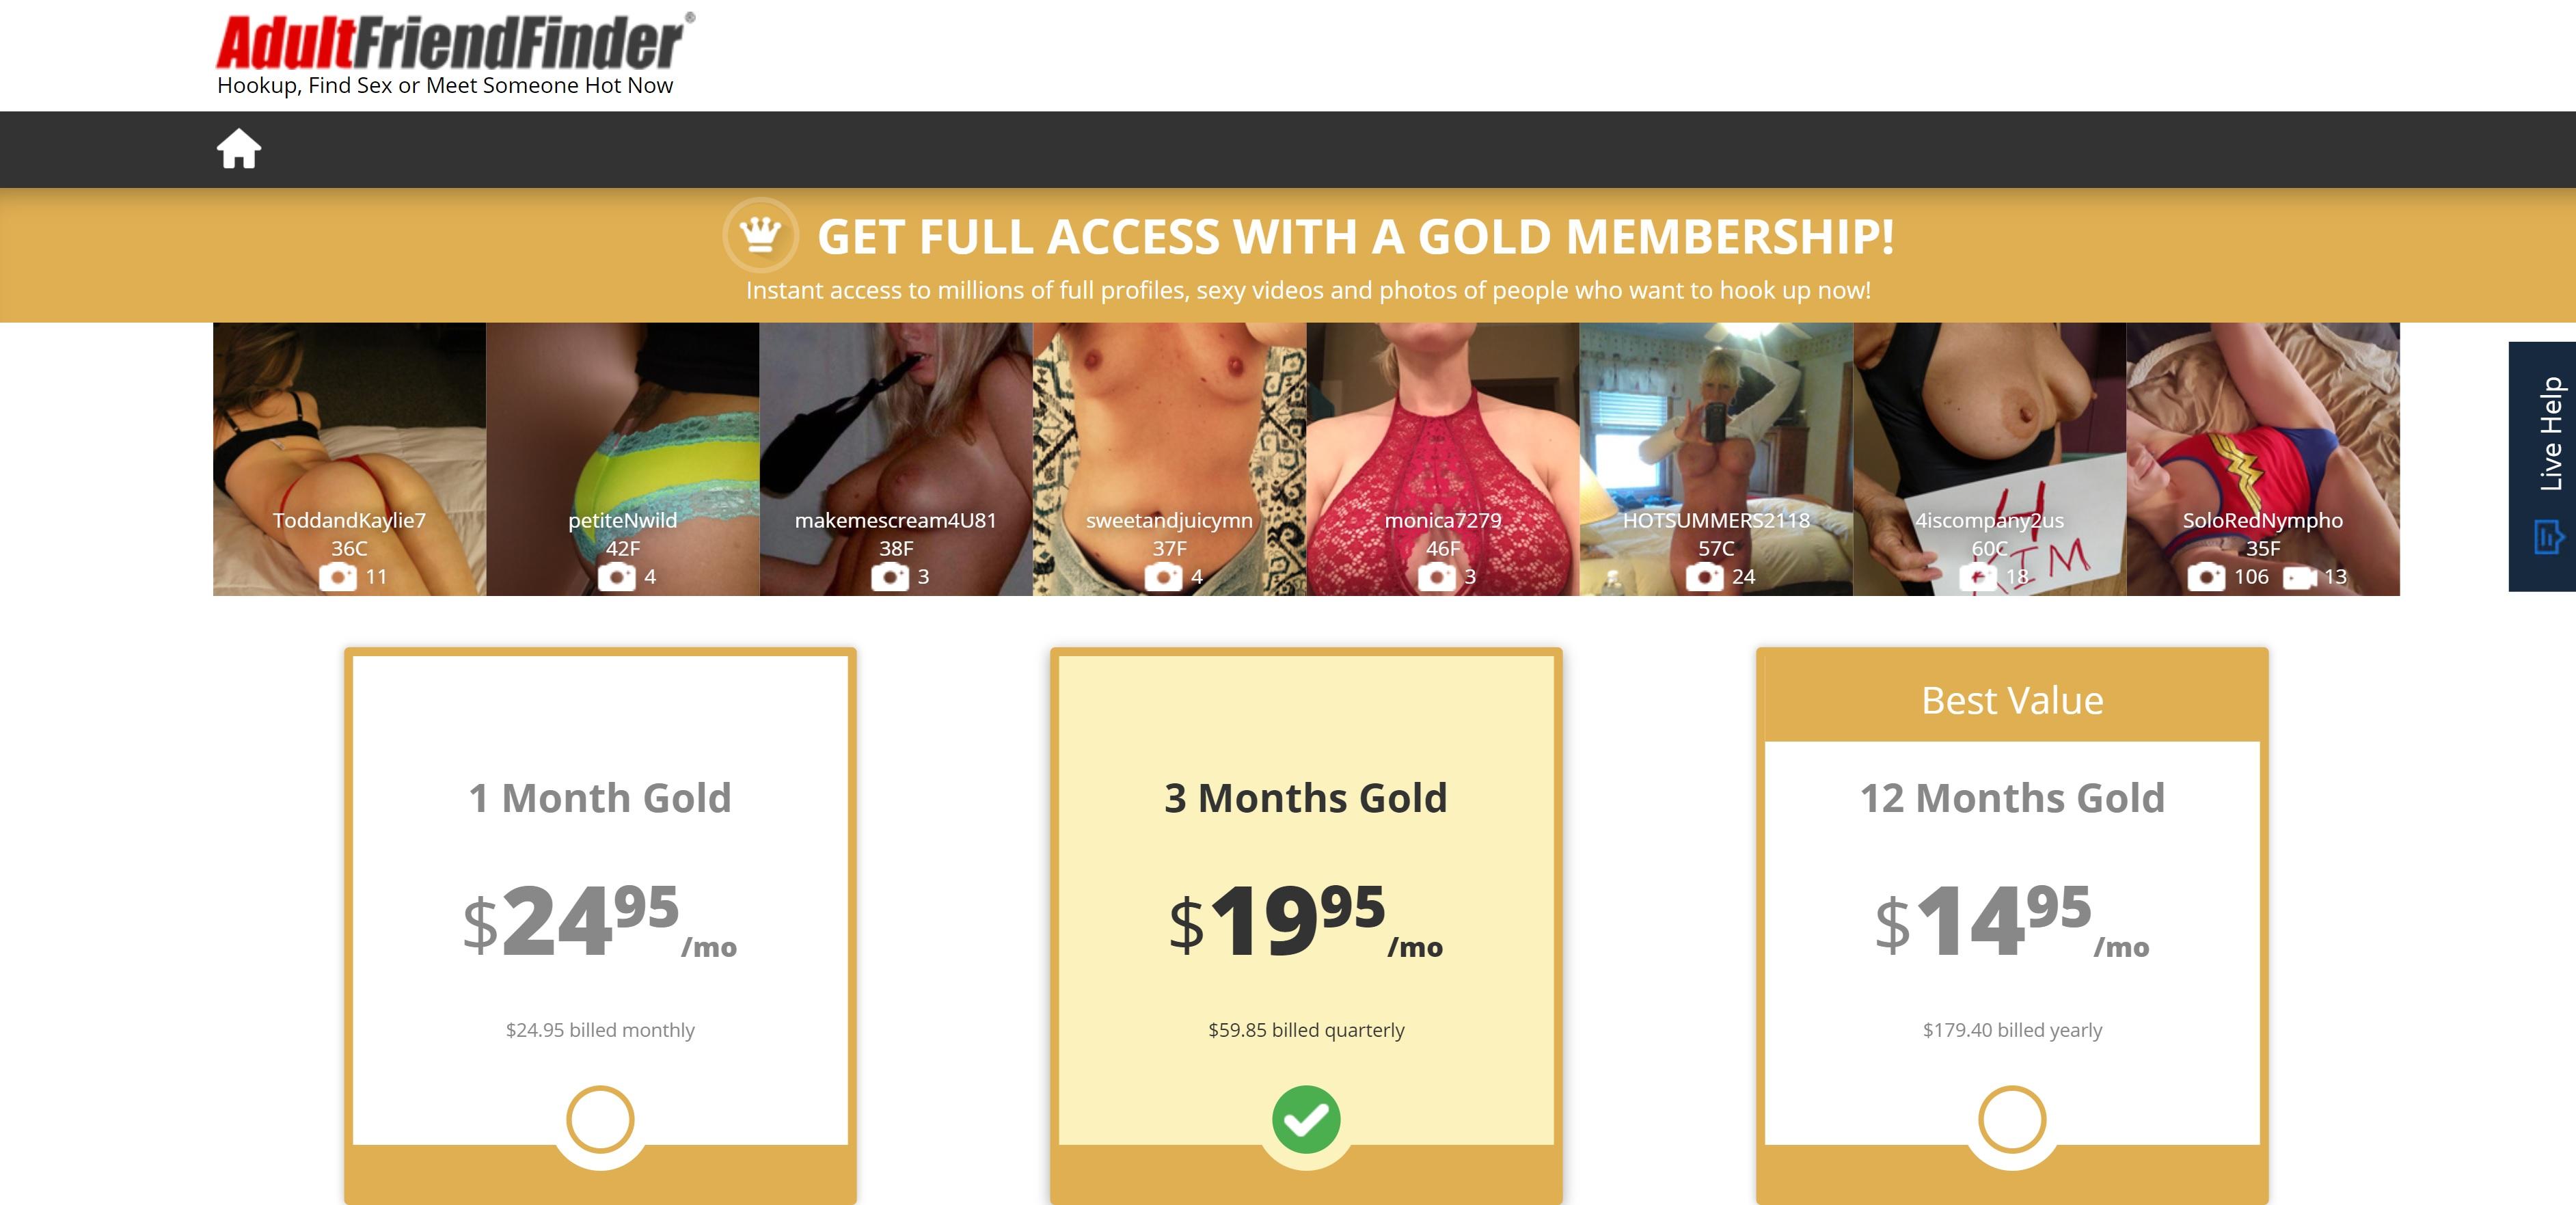 Find Friends, Legit Sex Hookup Site - Adult Friend Finder Review